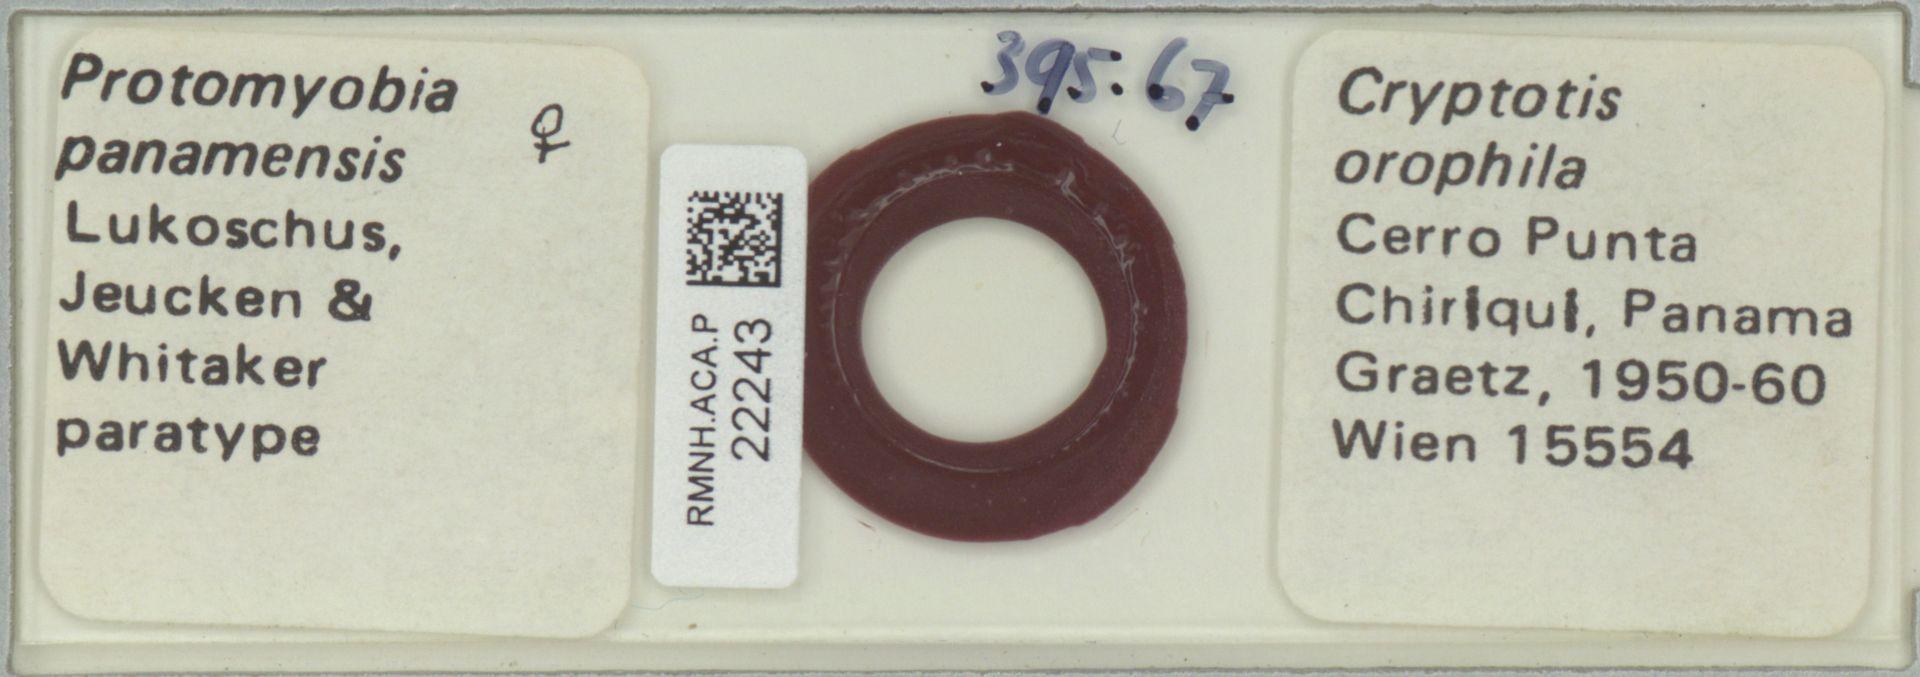 RMNH.ACA.P.22243 | Protomyobia panamensis Lukoschus, Jeucken & Whitaker